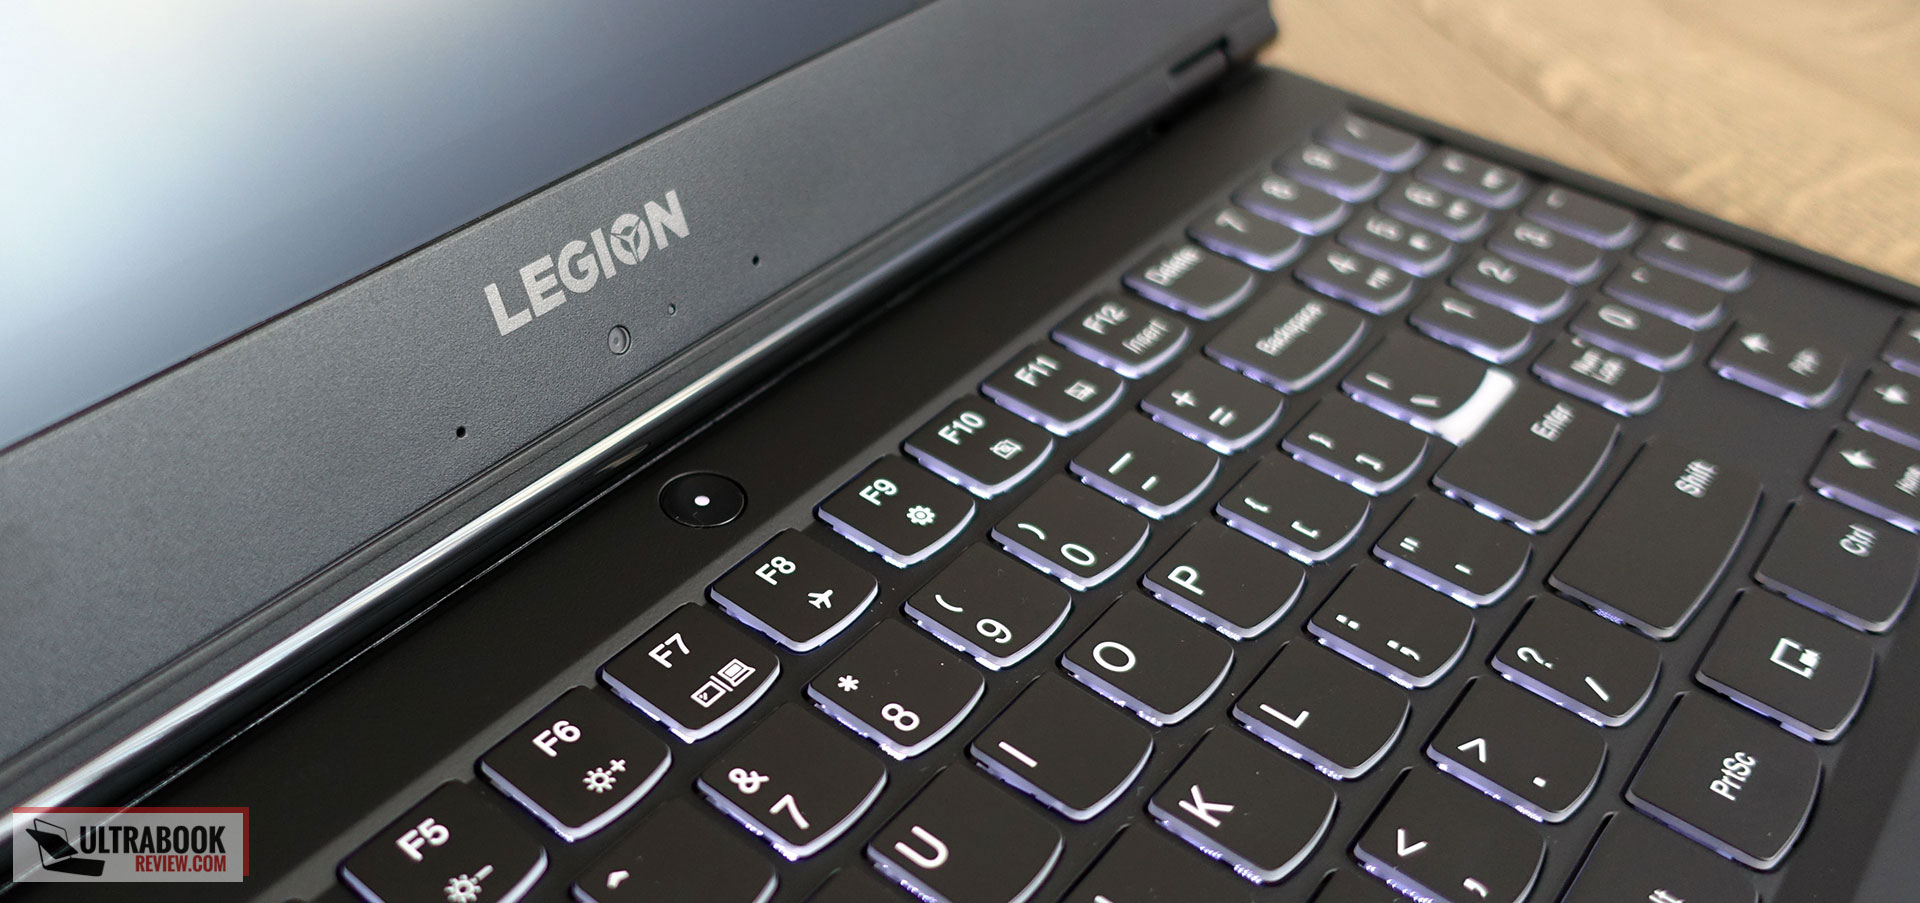 Lenovo Legion Y530 review (i7-8570H, GTX 1050 Ti, FHD 60 Hz screen)